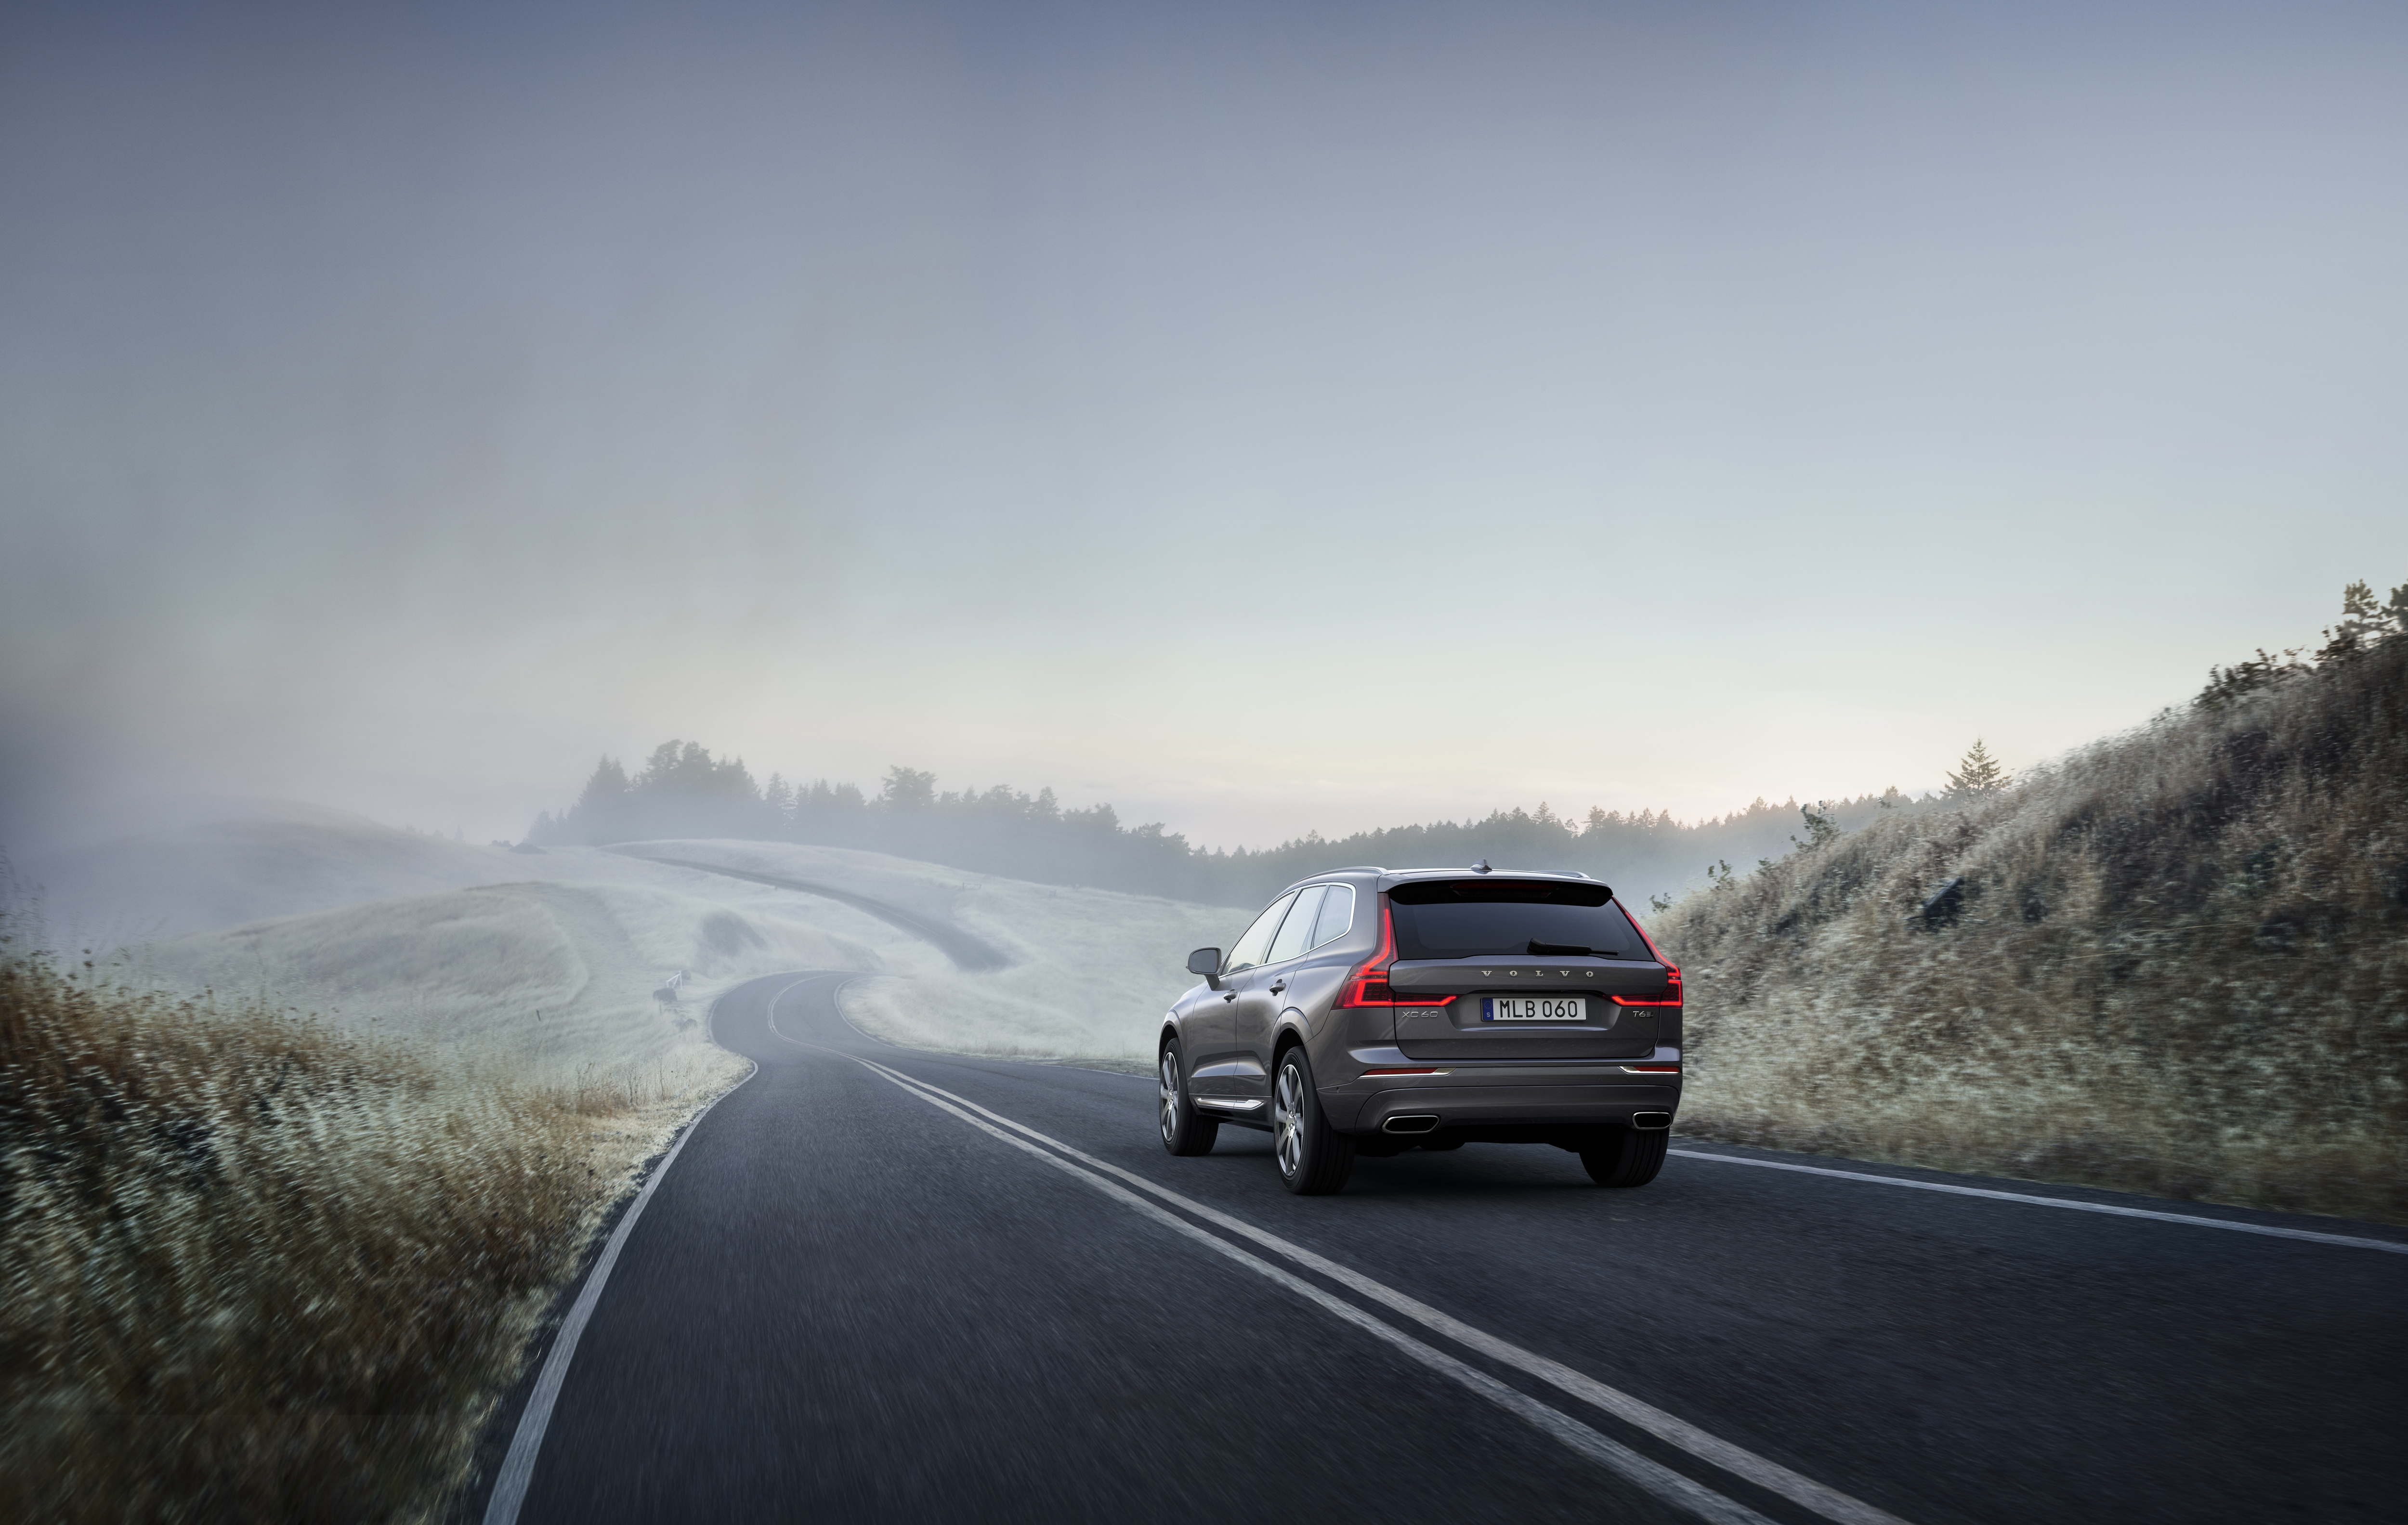 Volvo XC60 Attacks Hot Luxury CUV Market